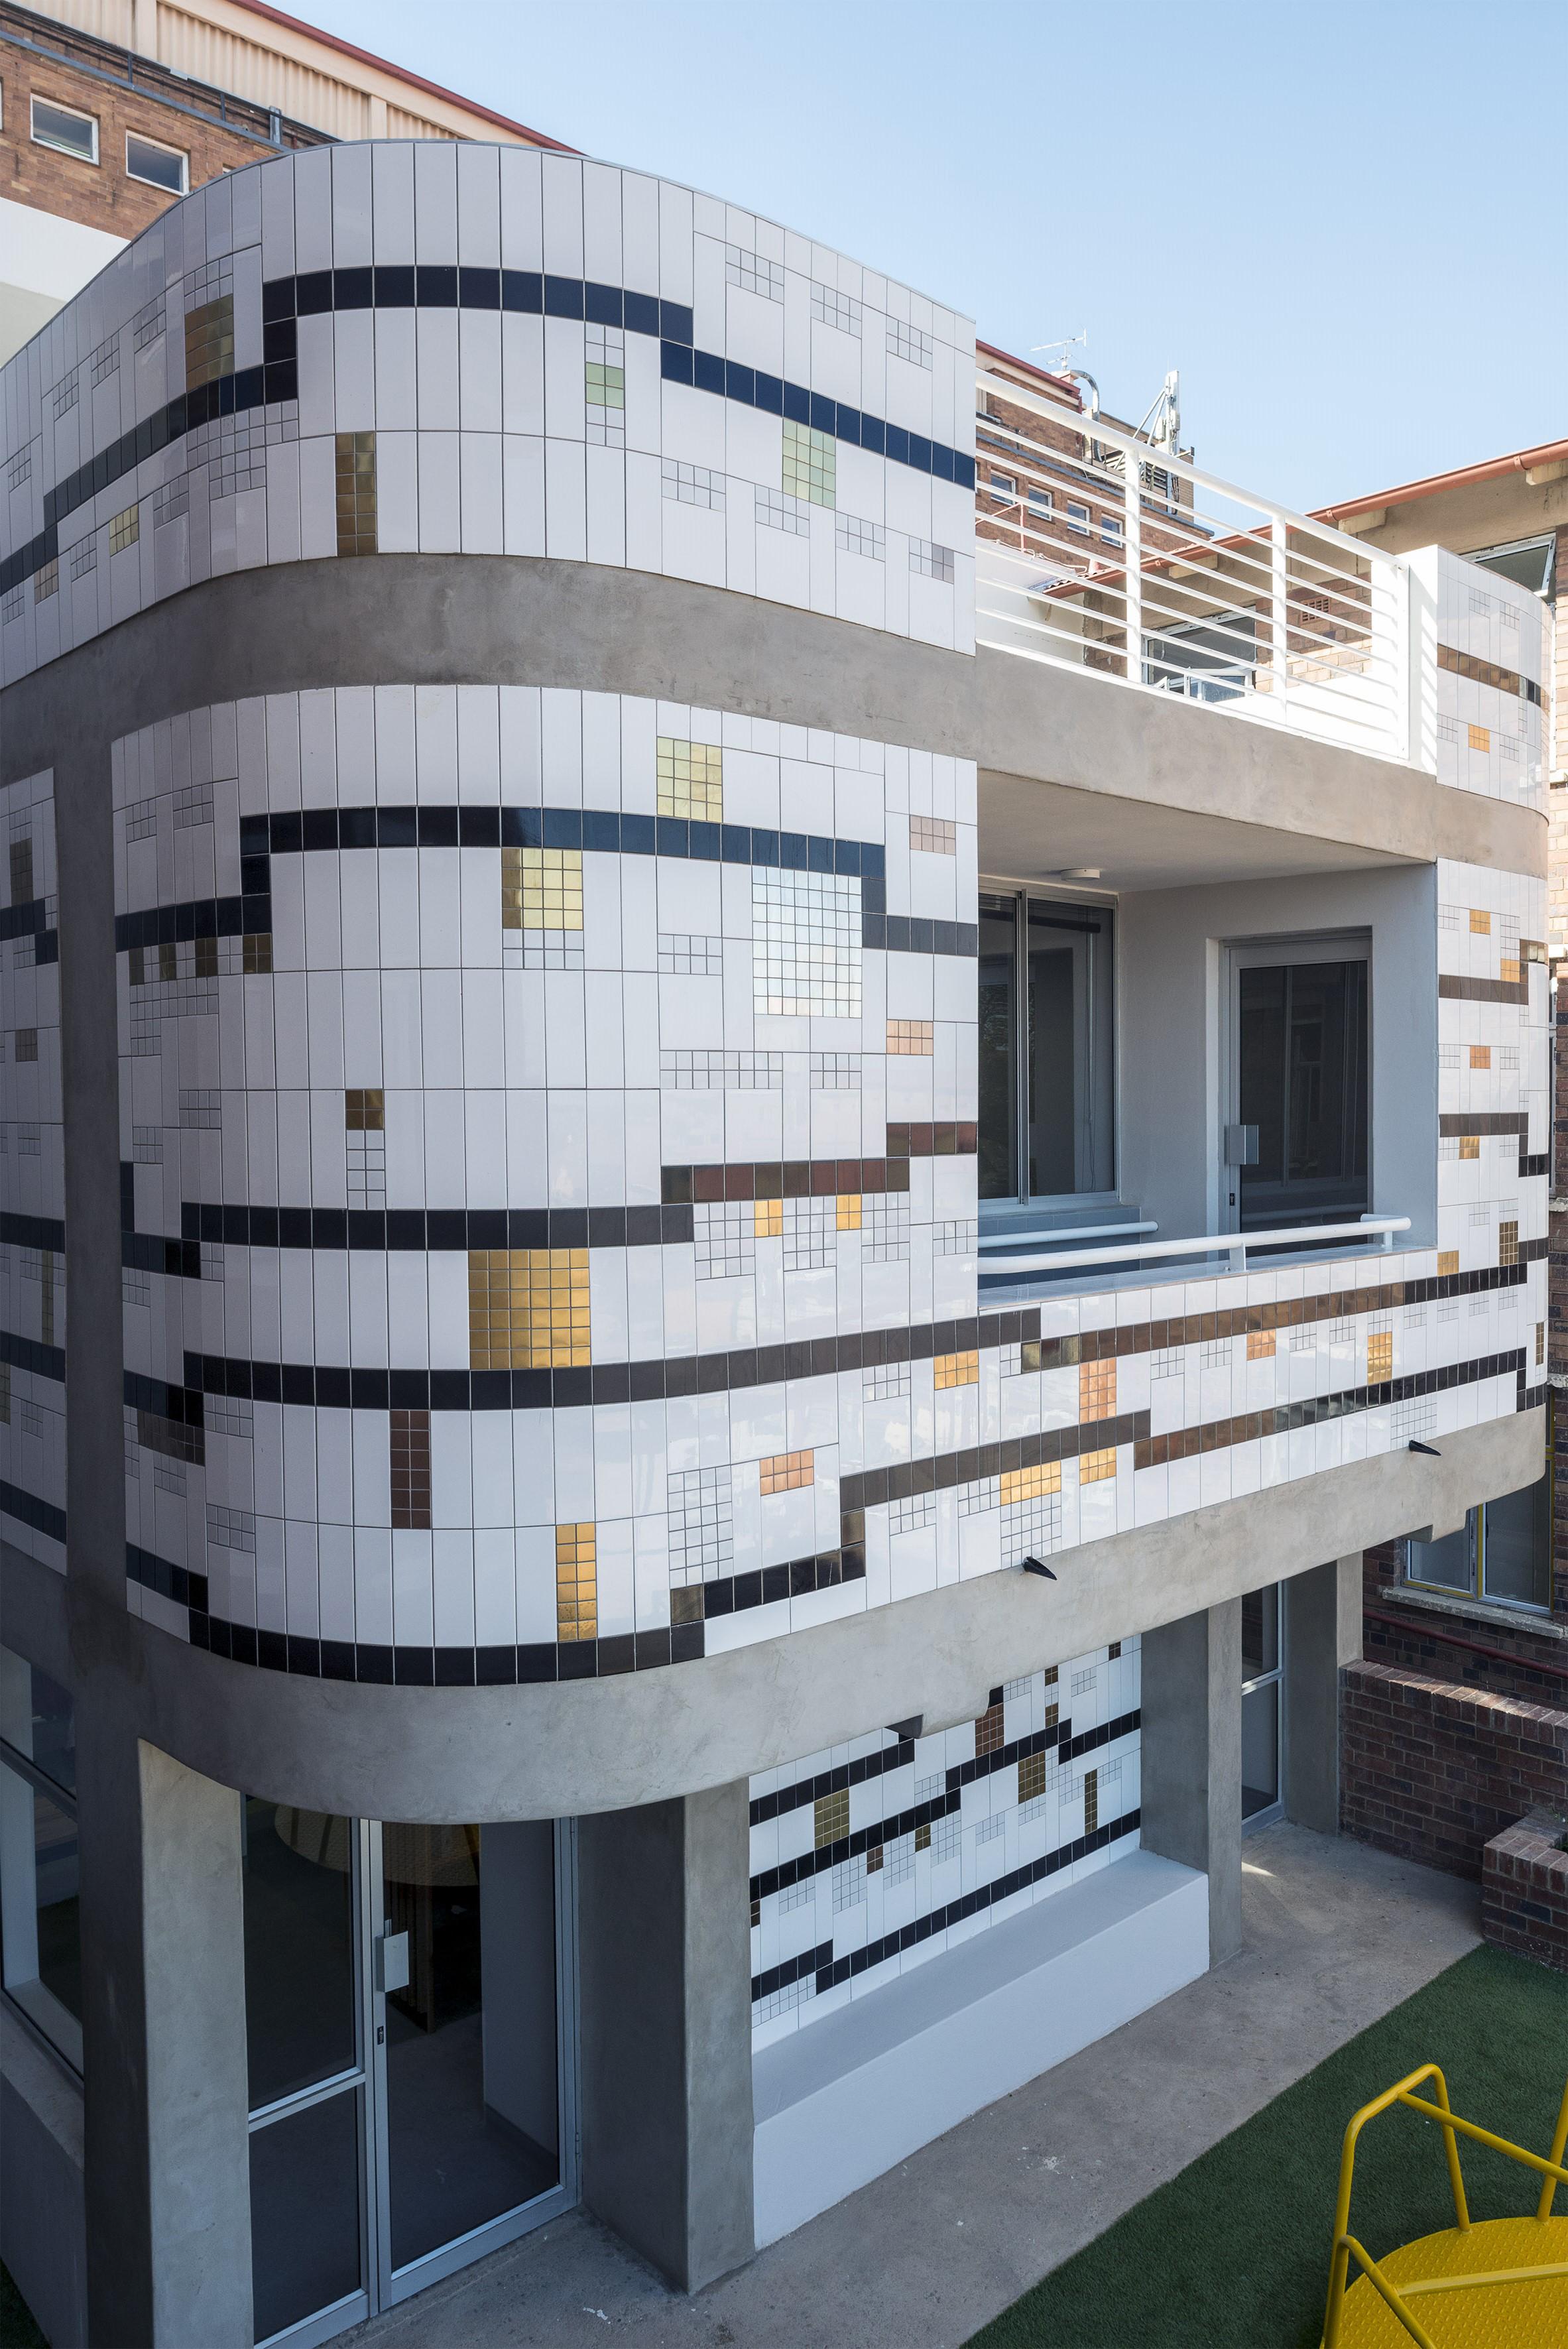 Mural at Rahima Moosa Hospital, Coronationville, Johannesburg, in collaboration with 2610' South Architects, 2016. Contractor Ashley Heron.Photograph : Dave Southwood. Lorenzo Nassimbeni